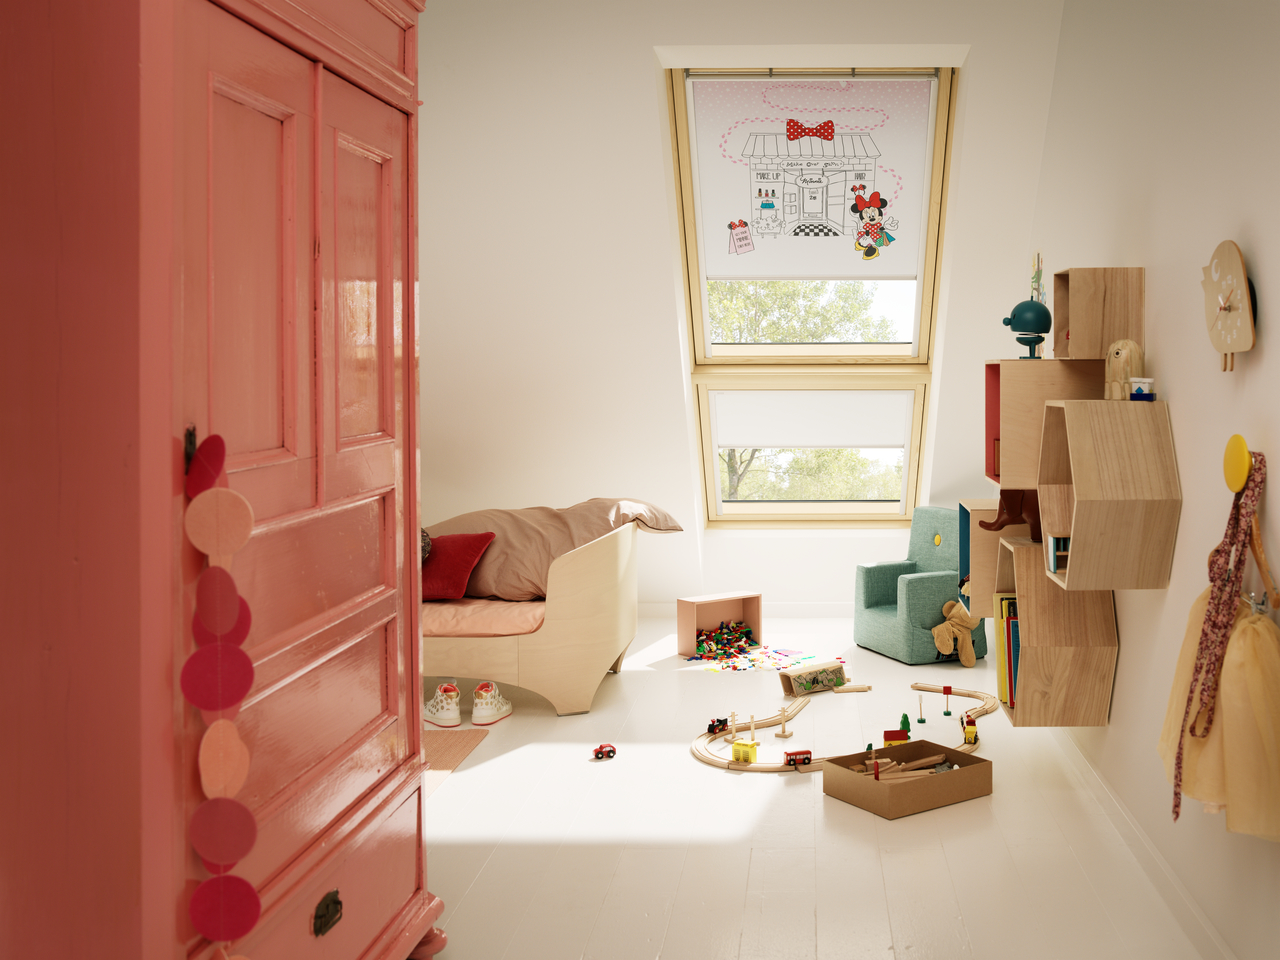 Decorare camera bambini adesivi murali bambini - Decorare camera bambini ...